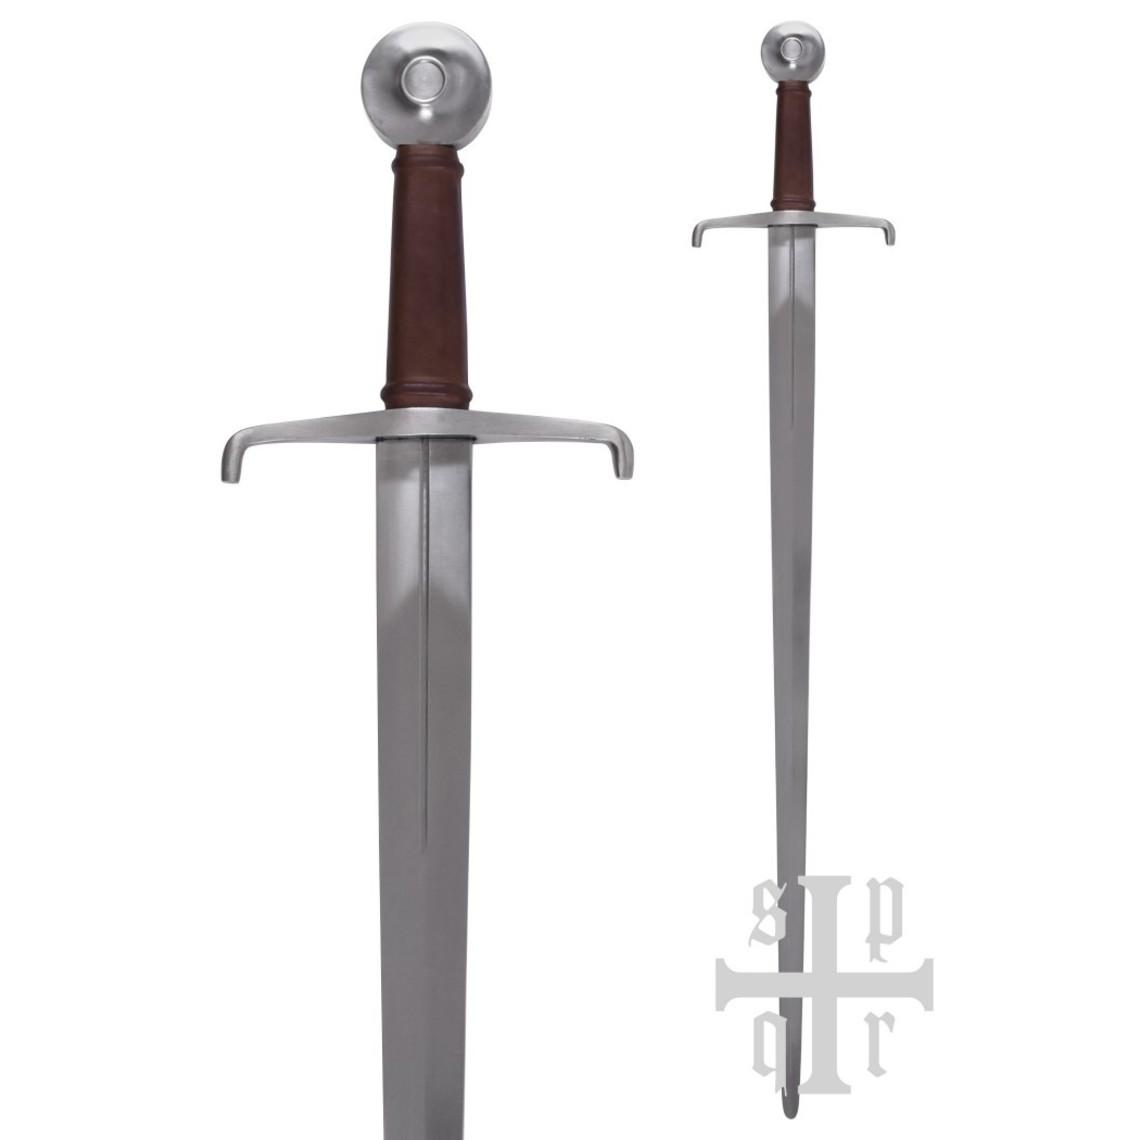 SPQR Spada medievale a una mano 1310, Royal Armouries, battle-ready